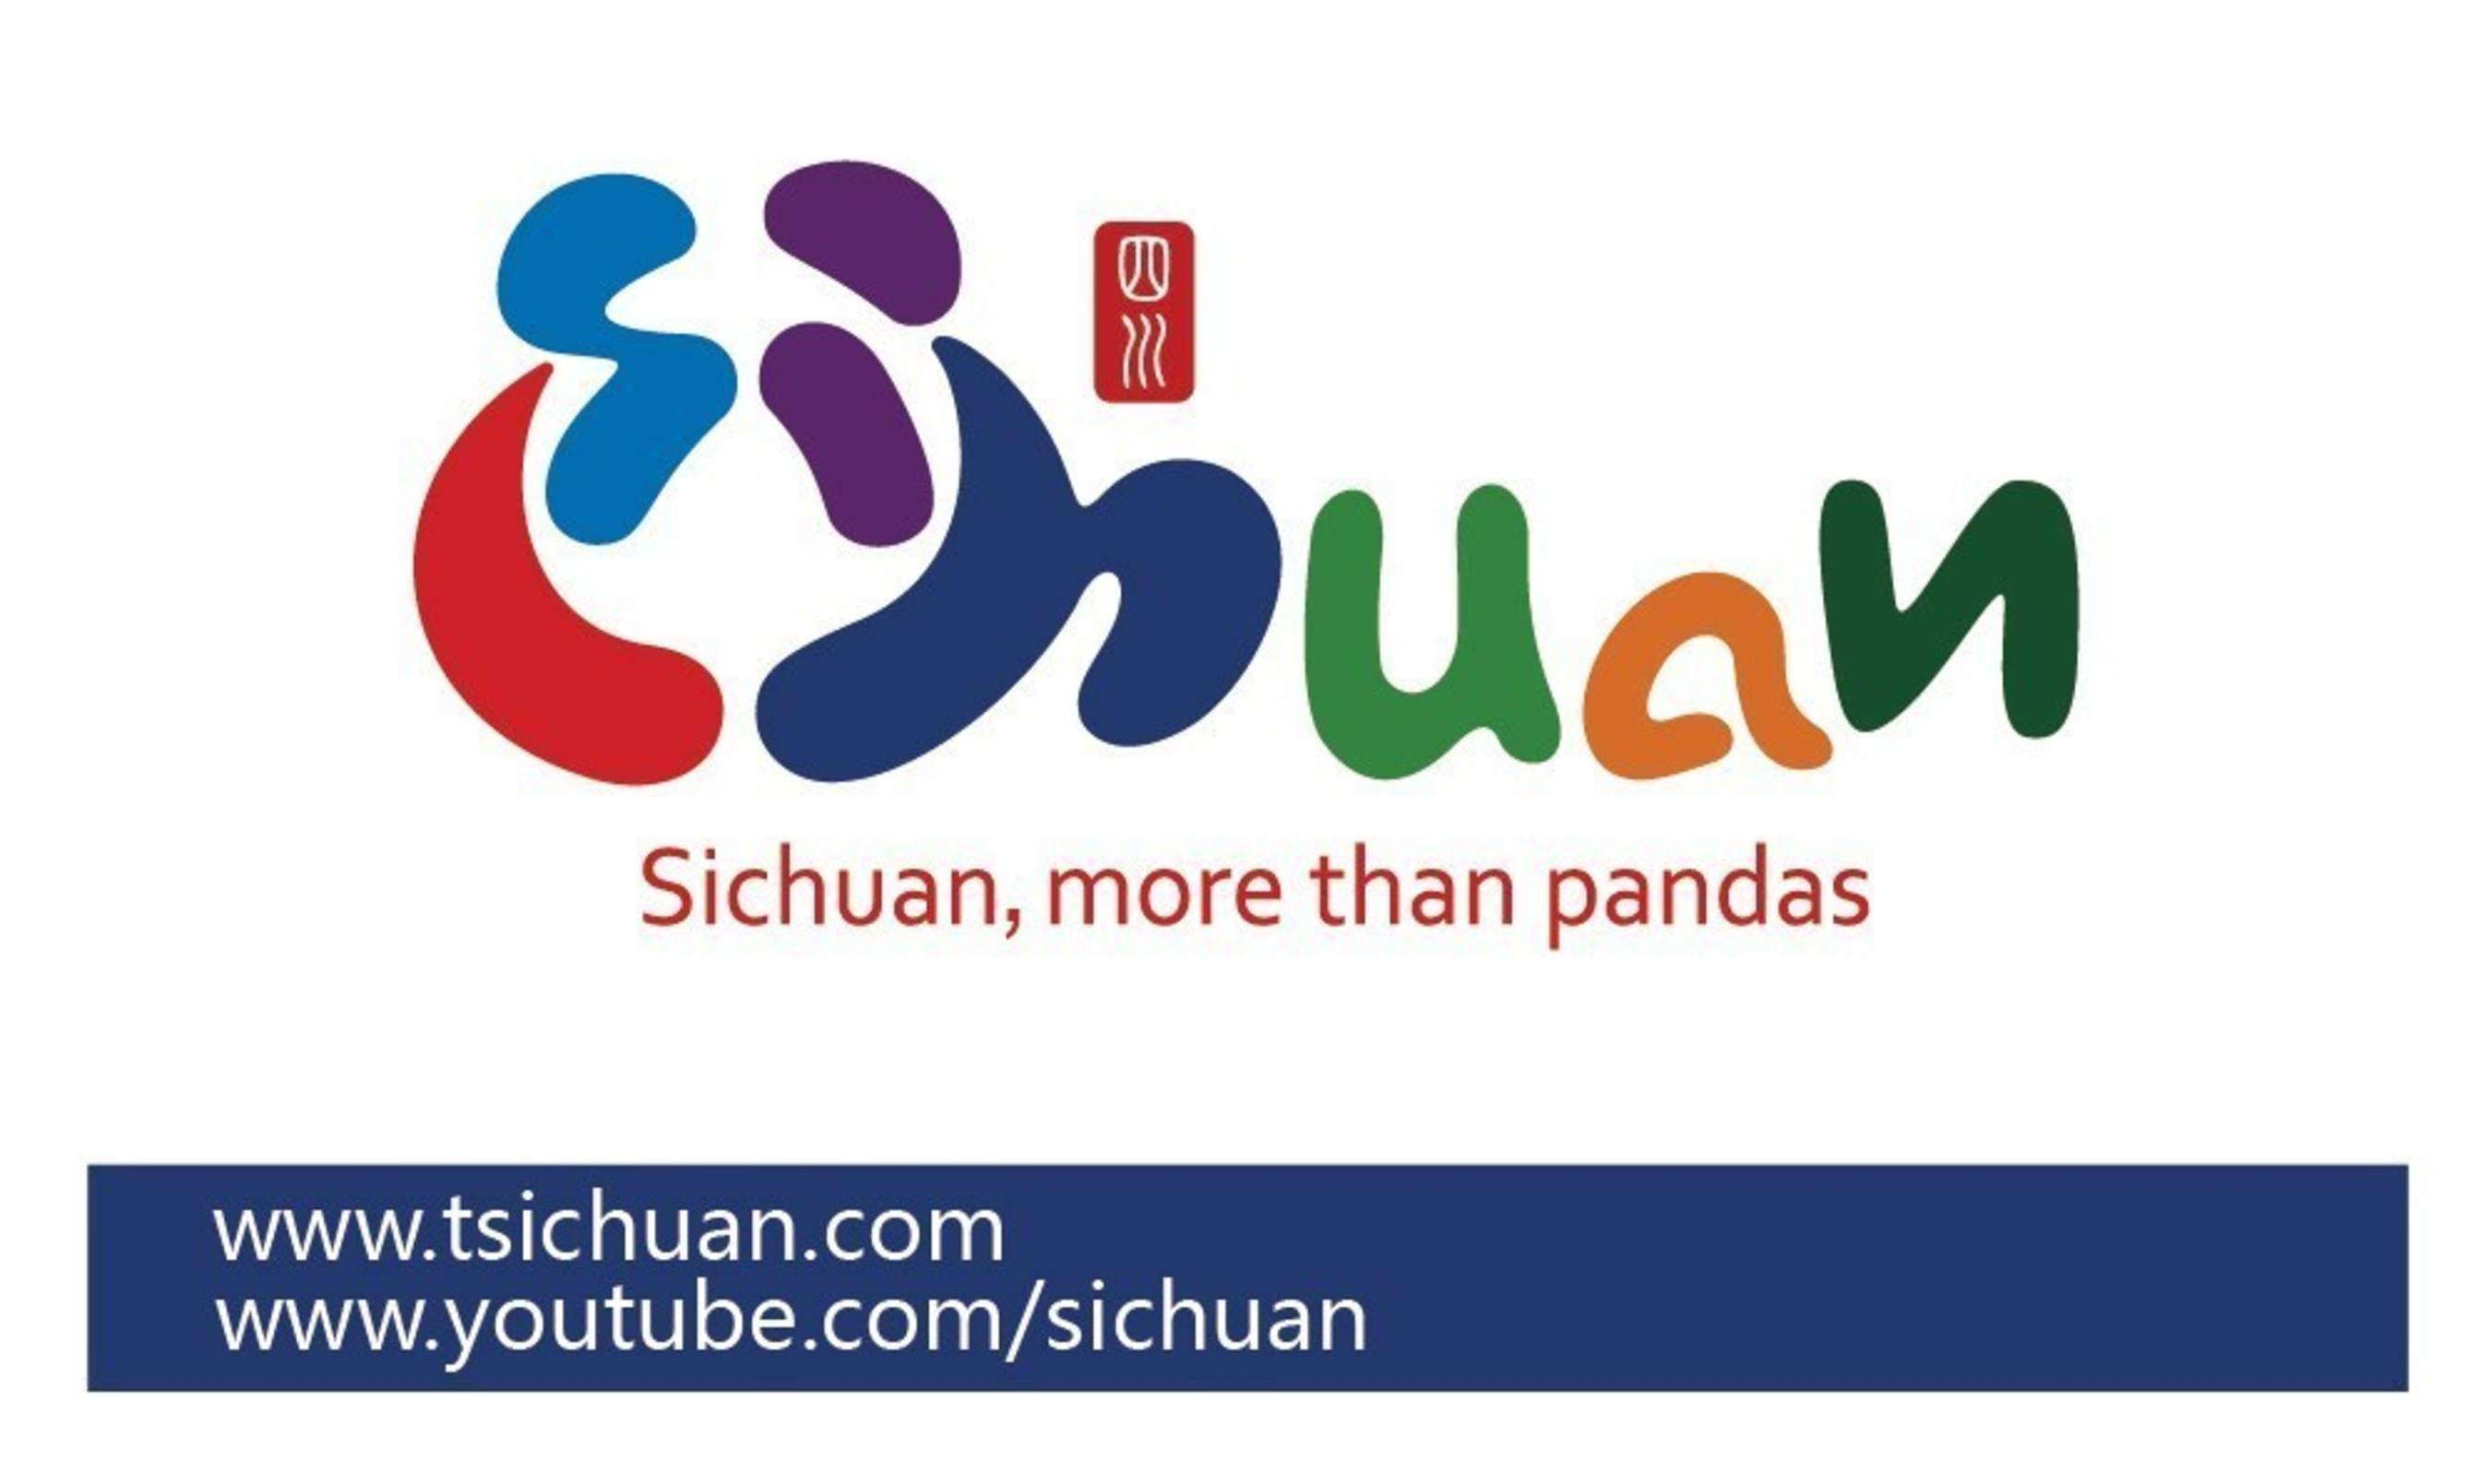 Sichuan, More Than Pandas -- China's Sichuan Province Issues New International Tourism Logo